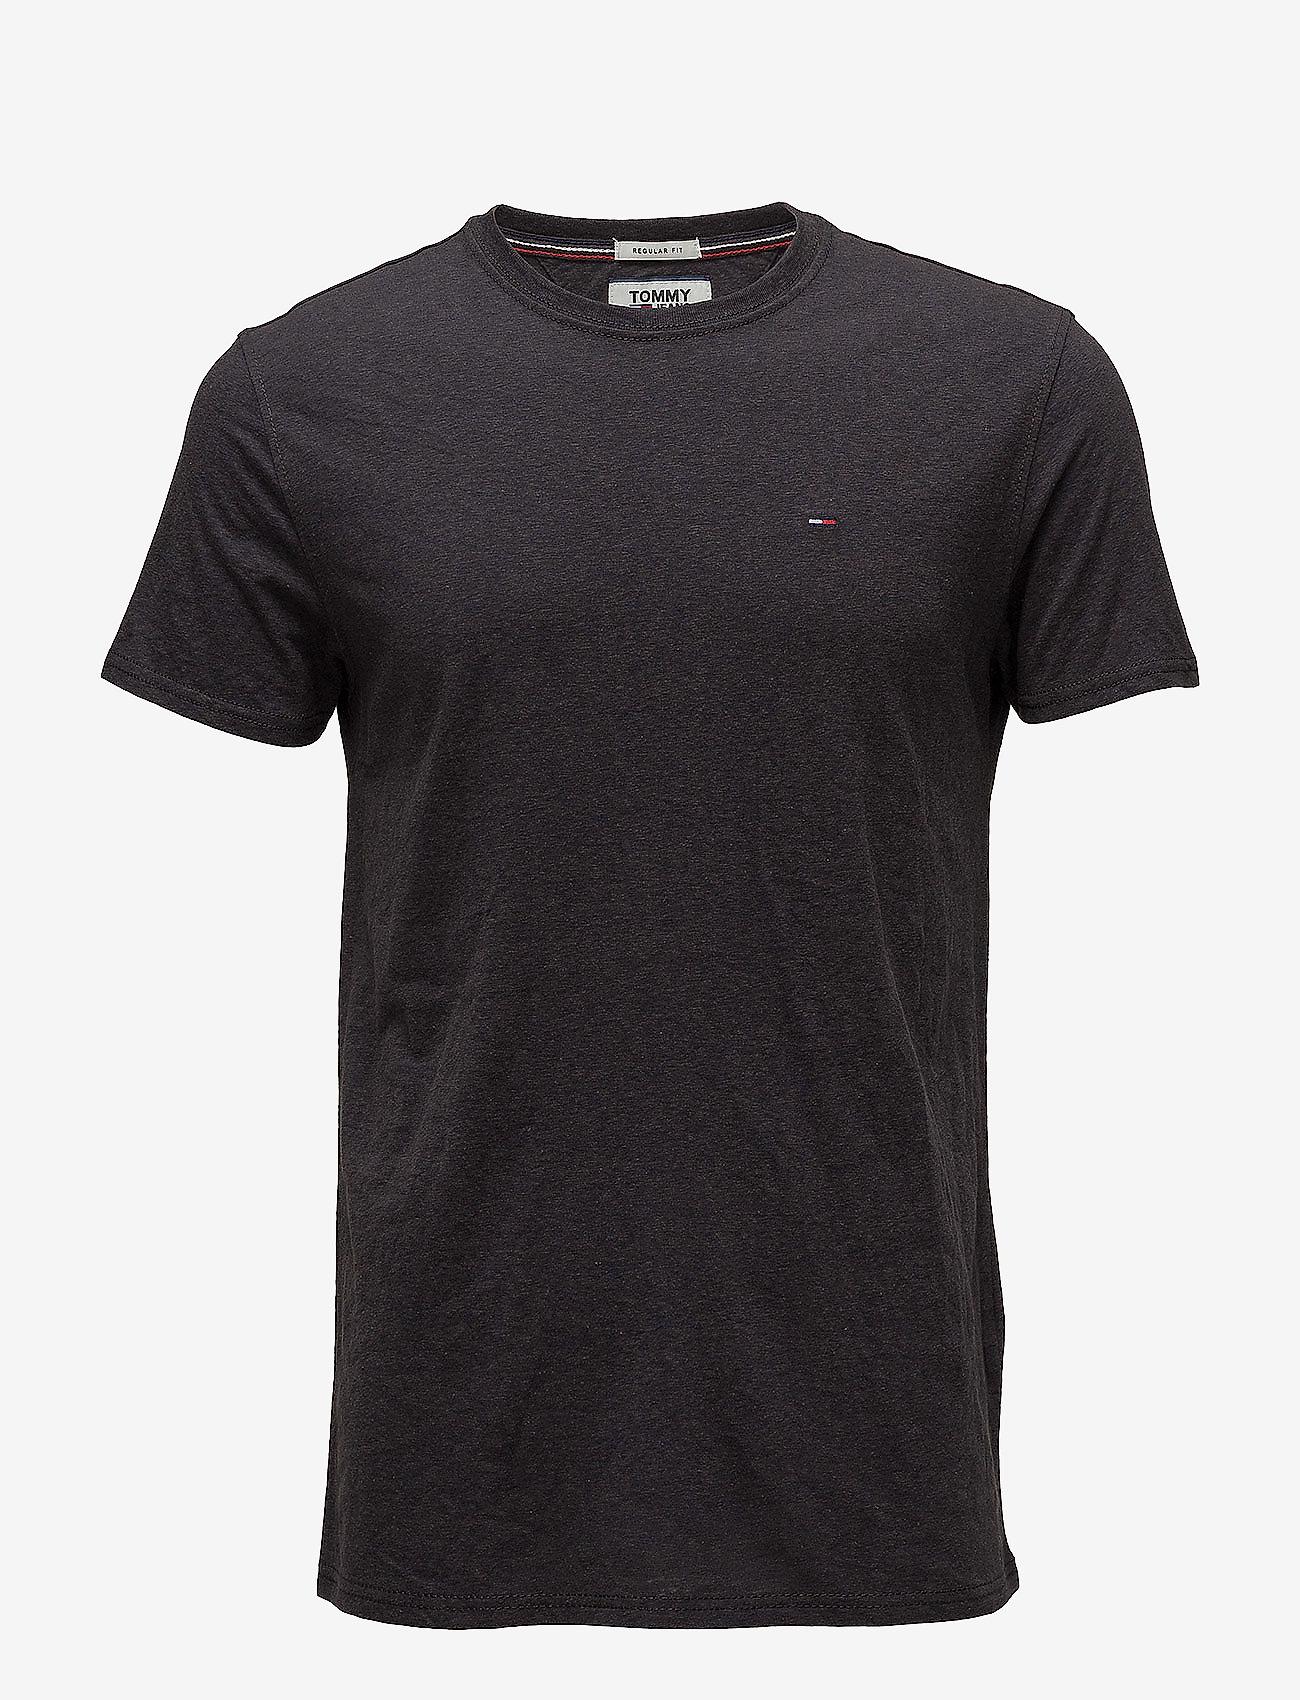 Tommy Jeans - TJM ORIGINAL TRIBLEND TEE - basic t-shirts - tommy black - 0